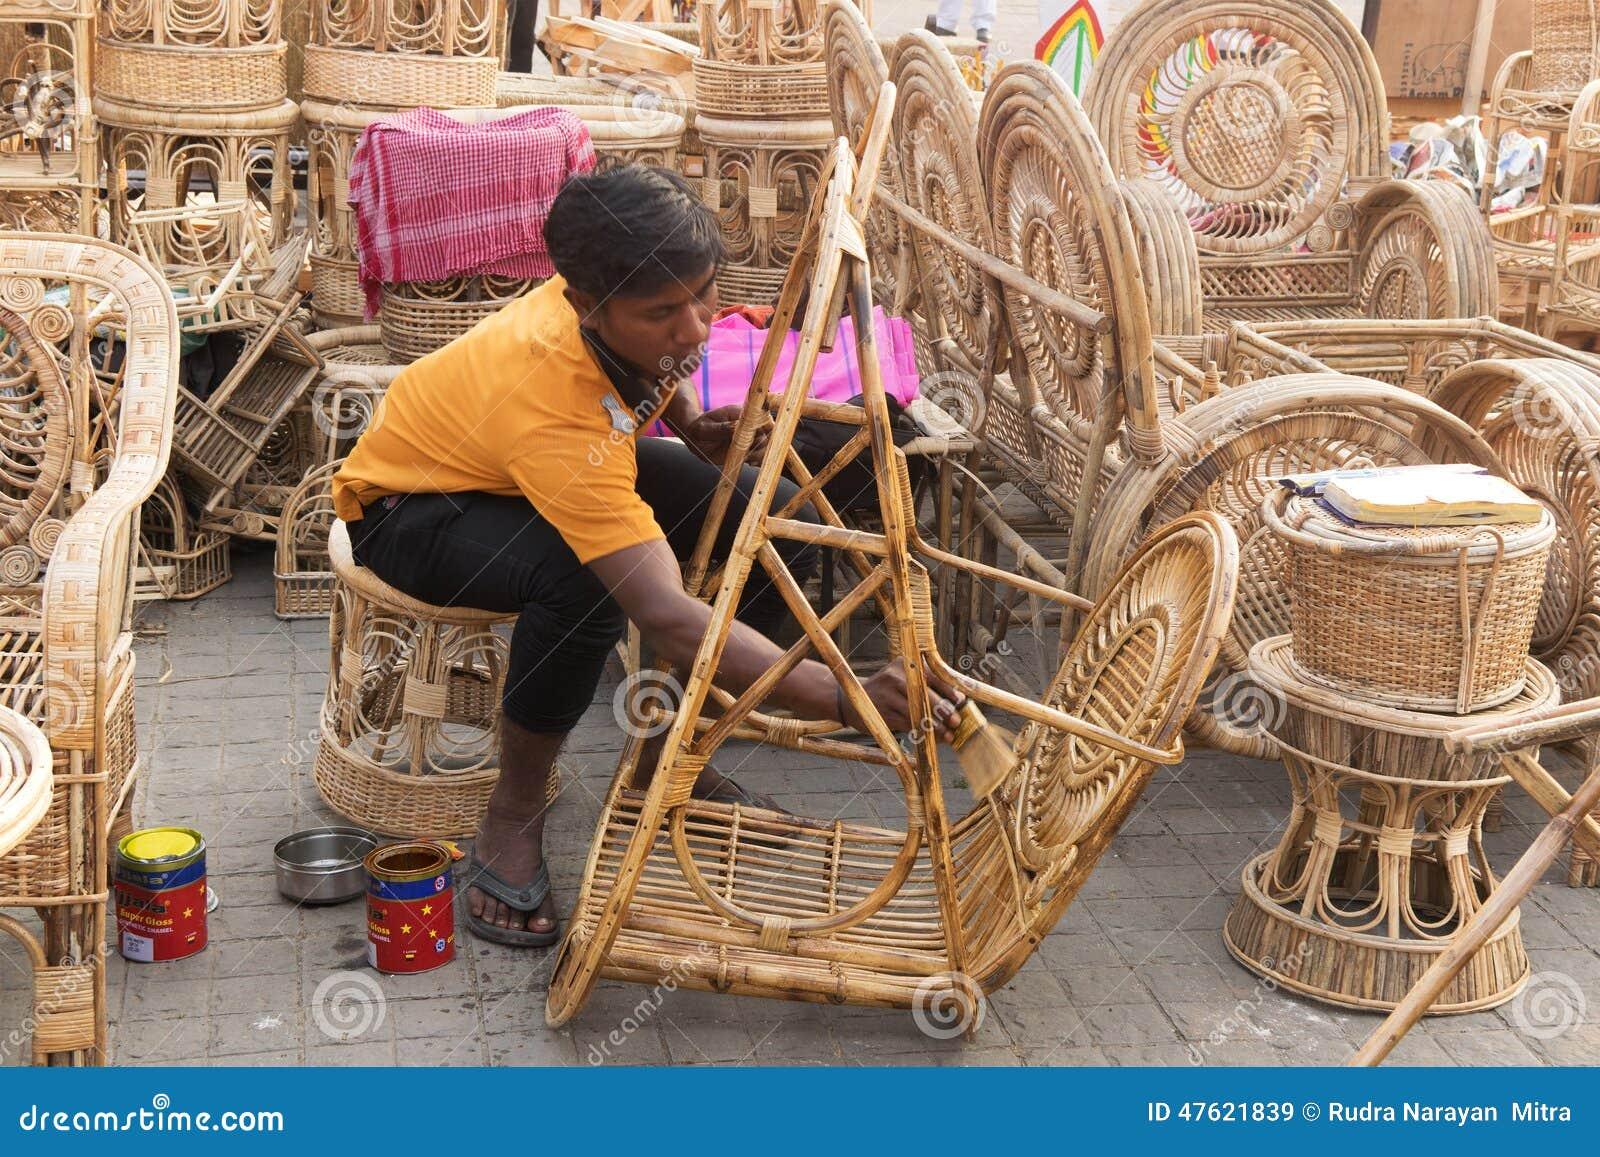 Cane Furnitures Indian Handicrafts Fair Editorial Stock